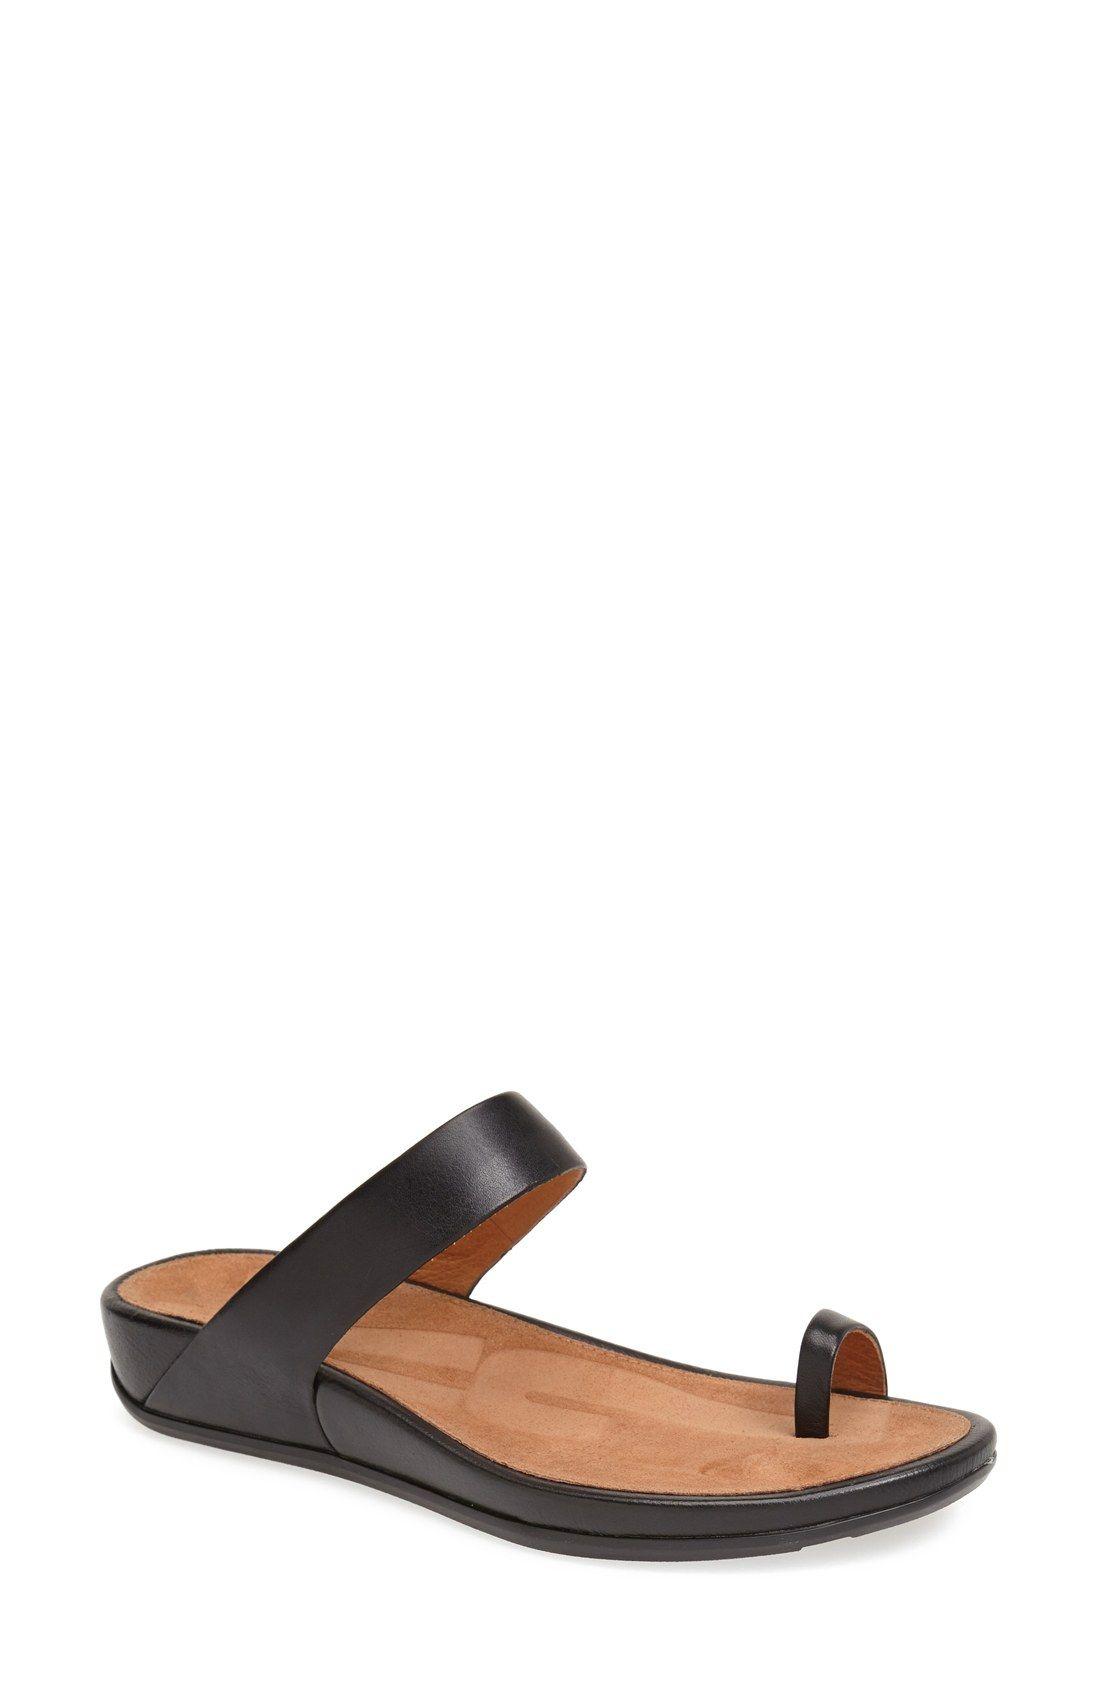 0a0c0803f09e5 FitFlop™  FF2 - De Loop  Slide Sandal (Women) (Nordstrom Exclusive ...